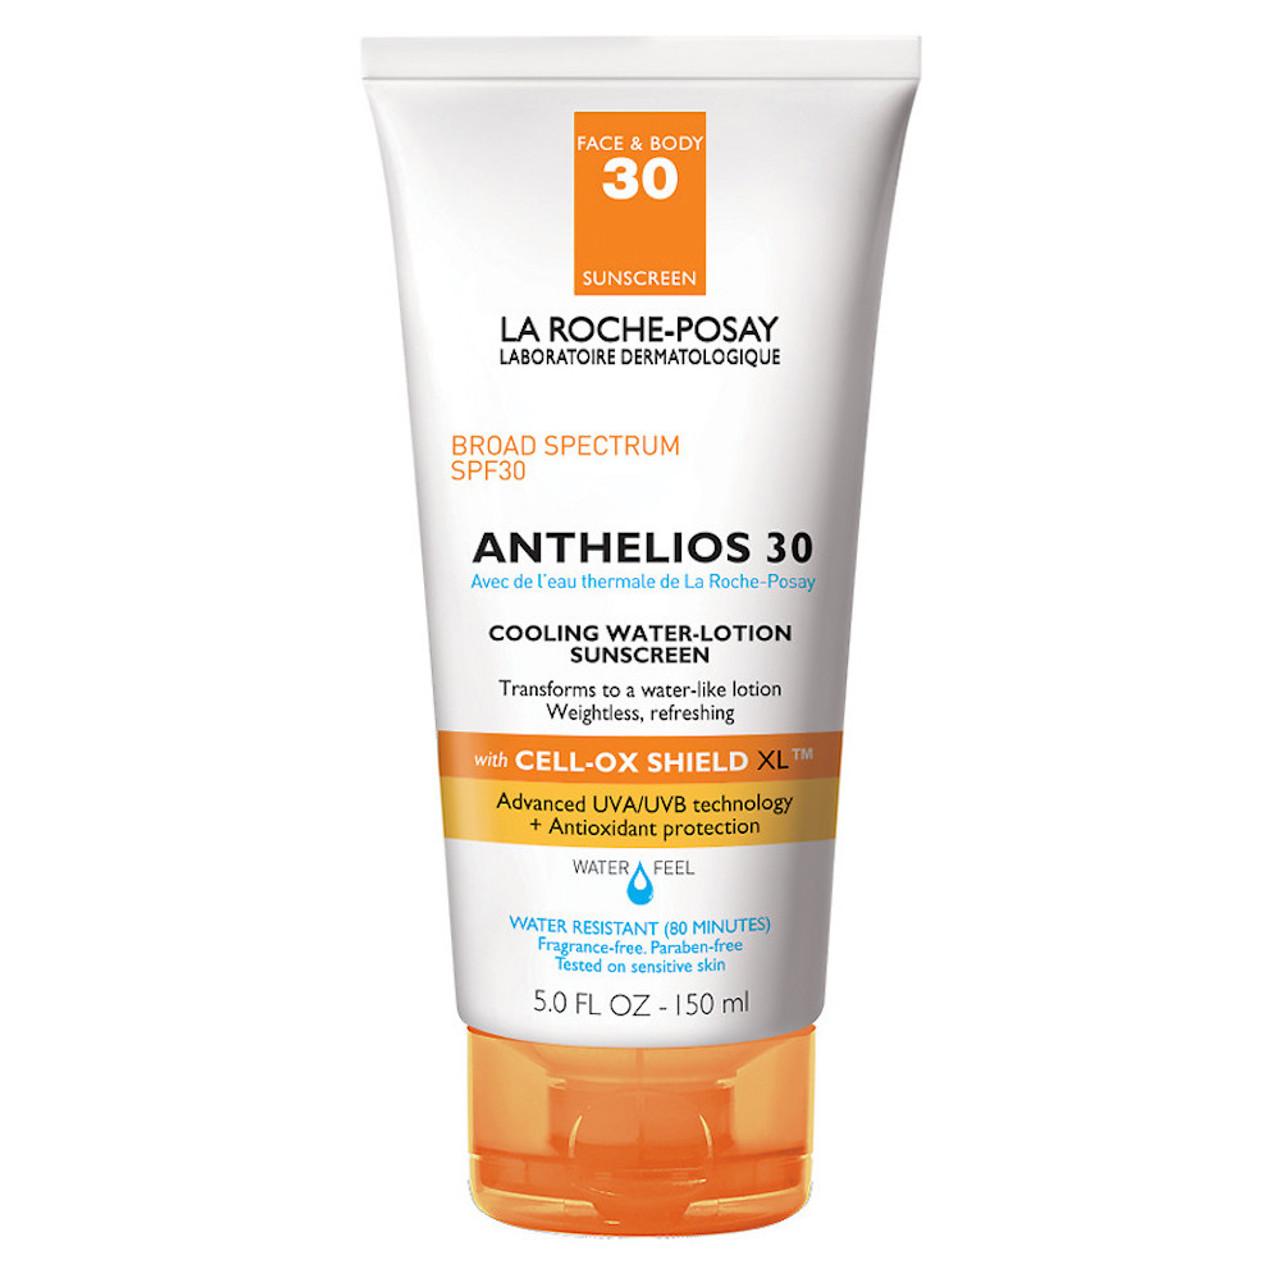 La Roche Posay Anthelios Cooling Water-Lotion Sunscreen SPF 30 BeautifiedYou.com